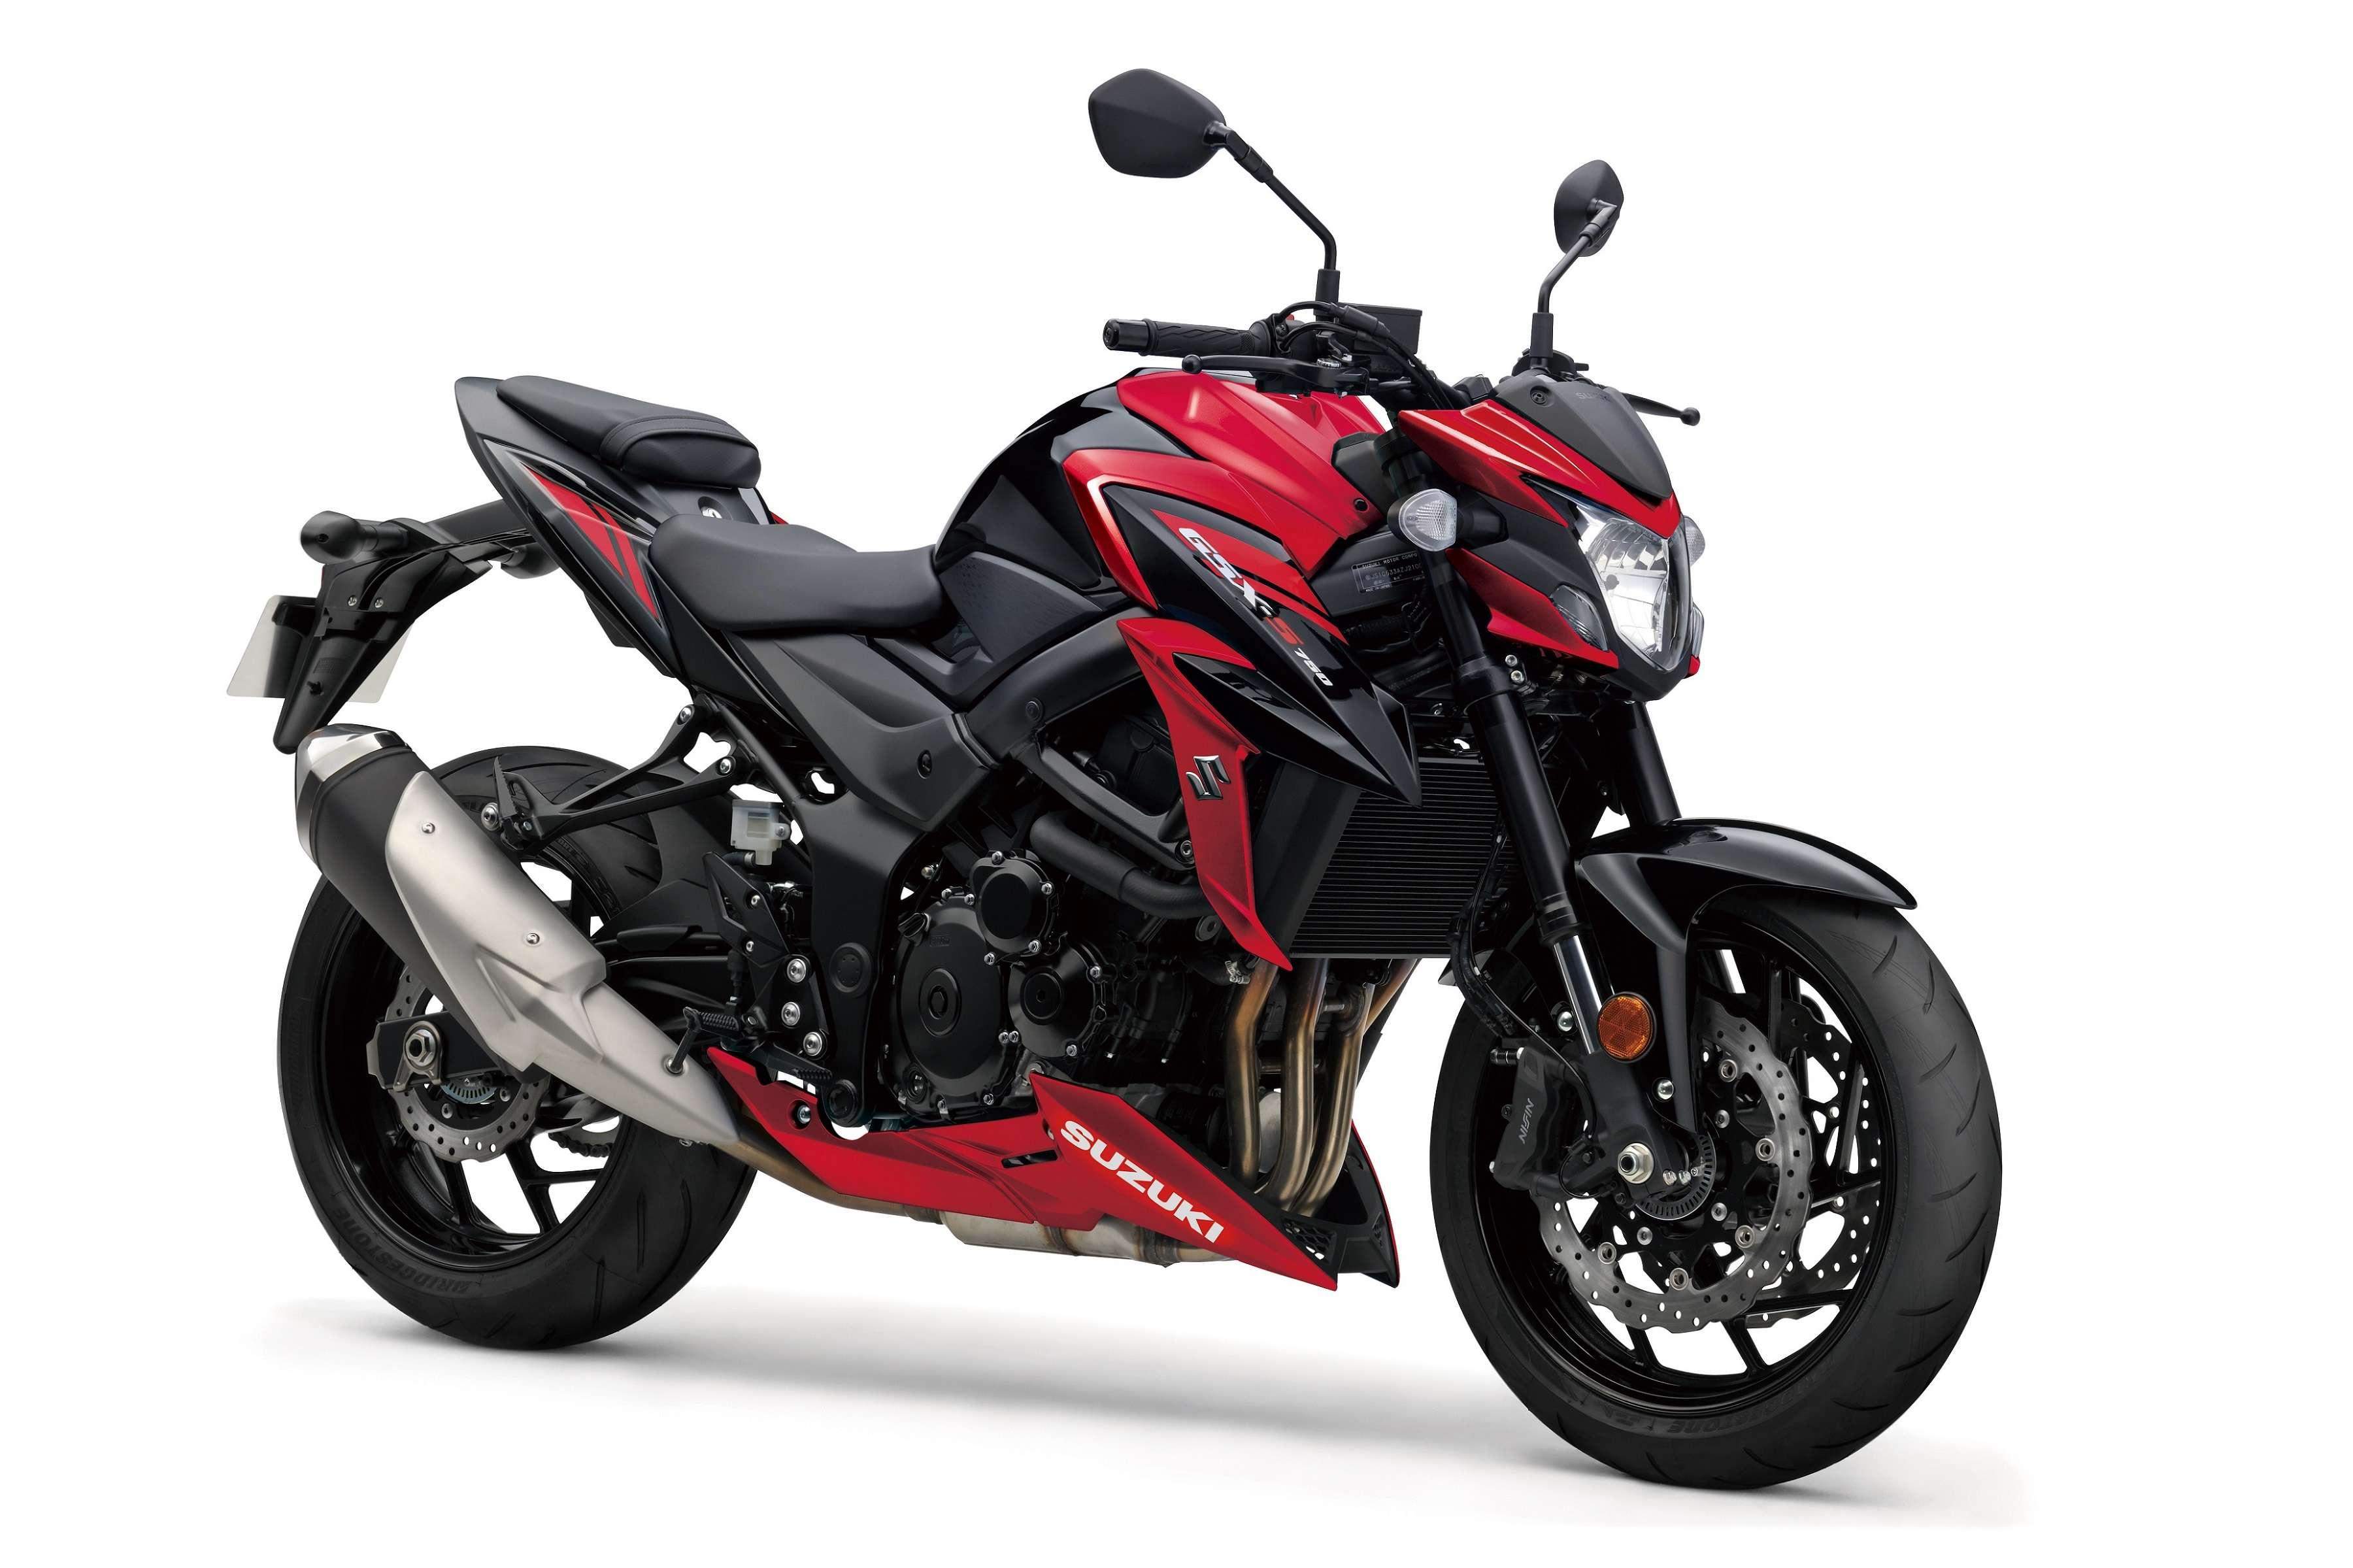 Suzuki Motorcycle India: Suzuki Motorcycle India launches GSX-S750